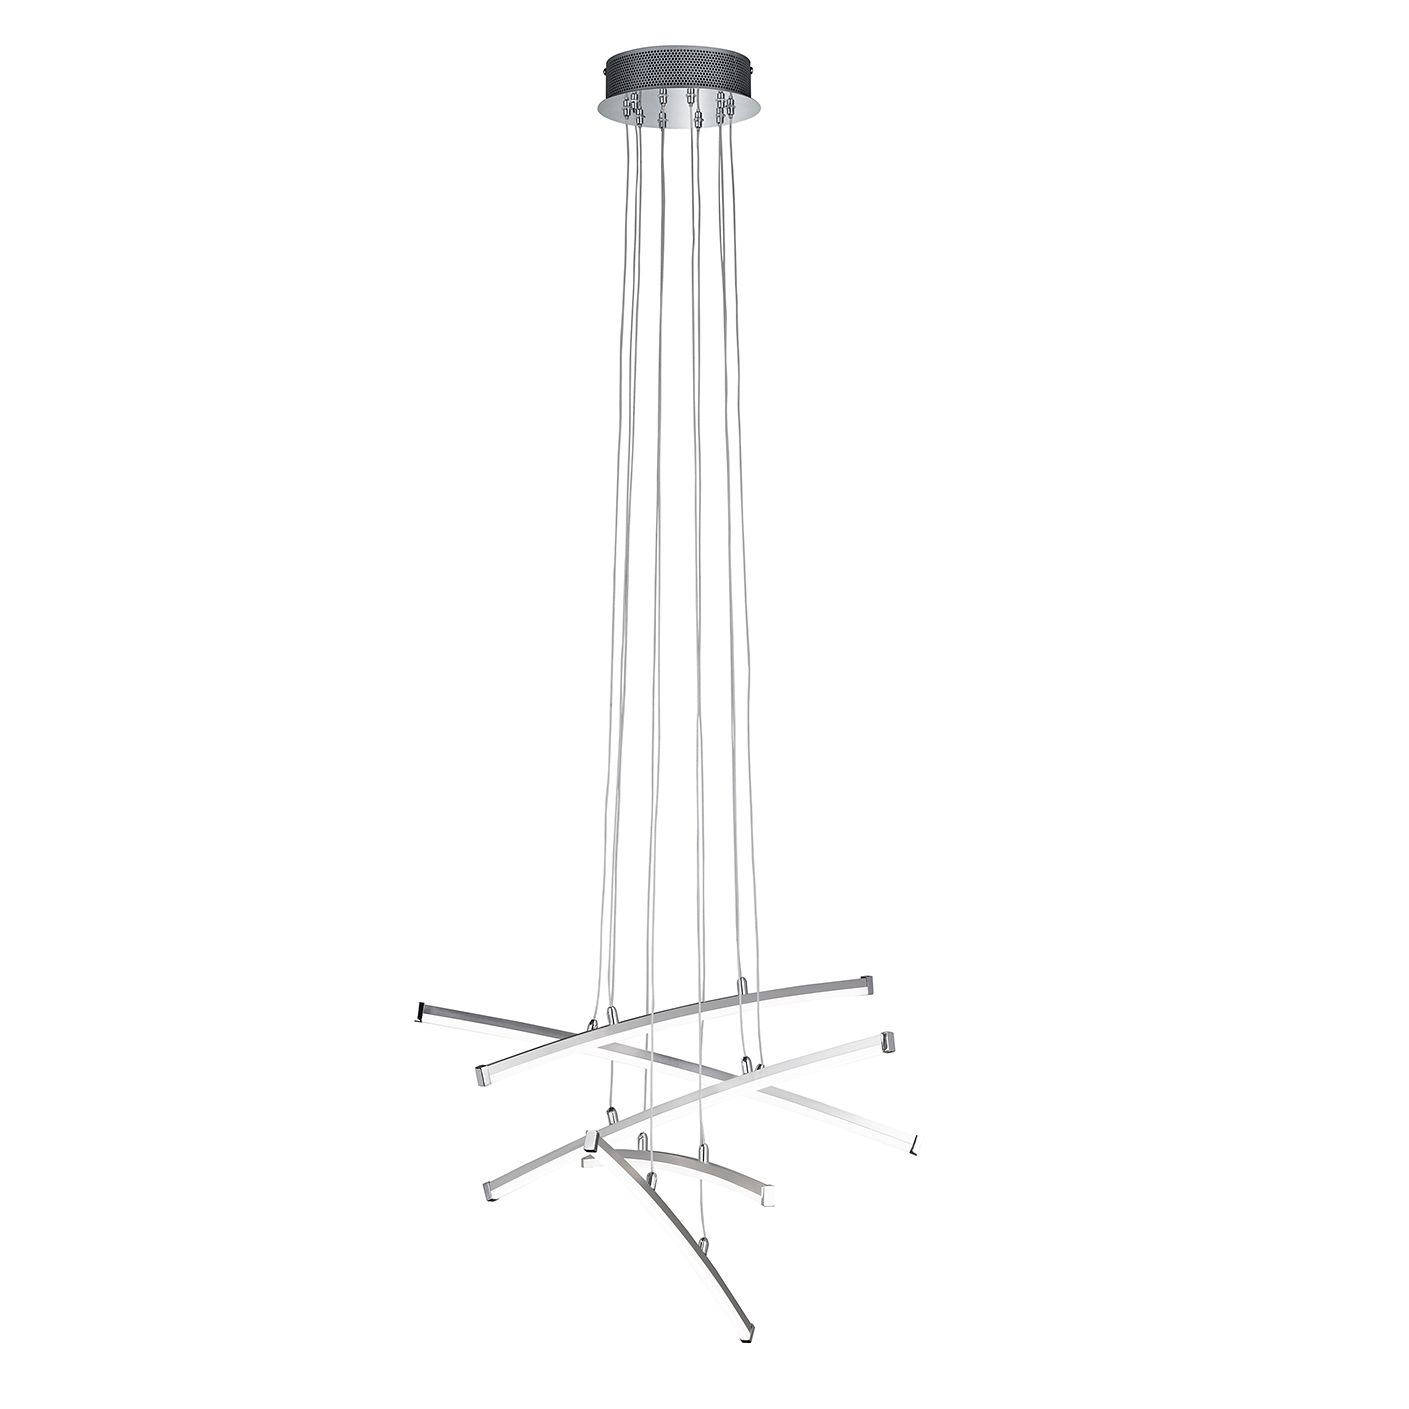 EEK A+, LED-Pendelleuchte Stella I - Glas / Metall - 5-flammig, Wofi